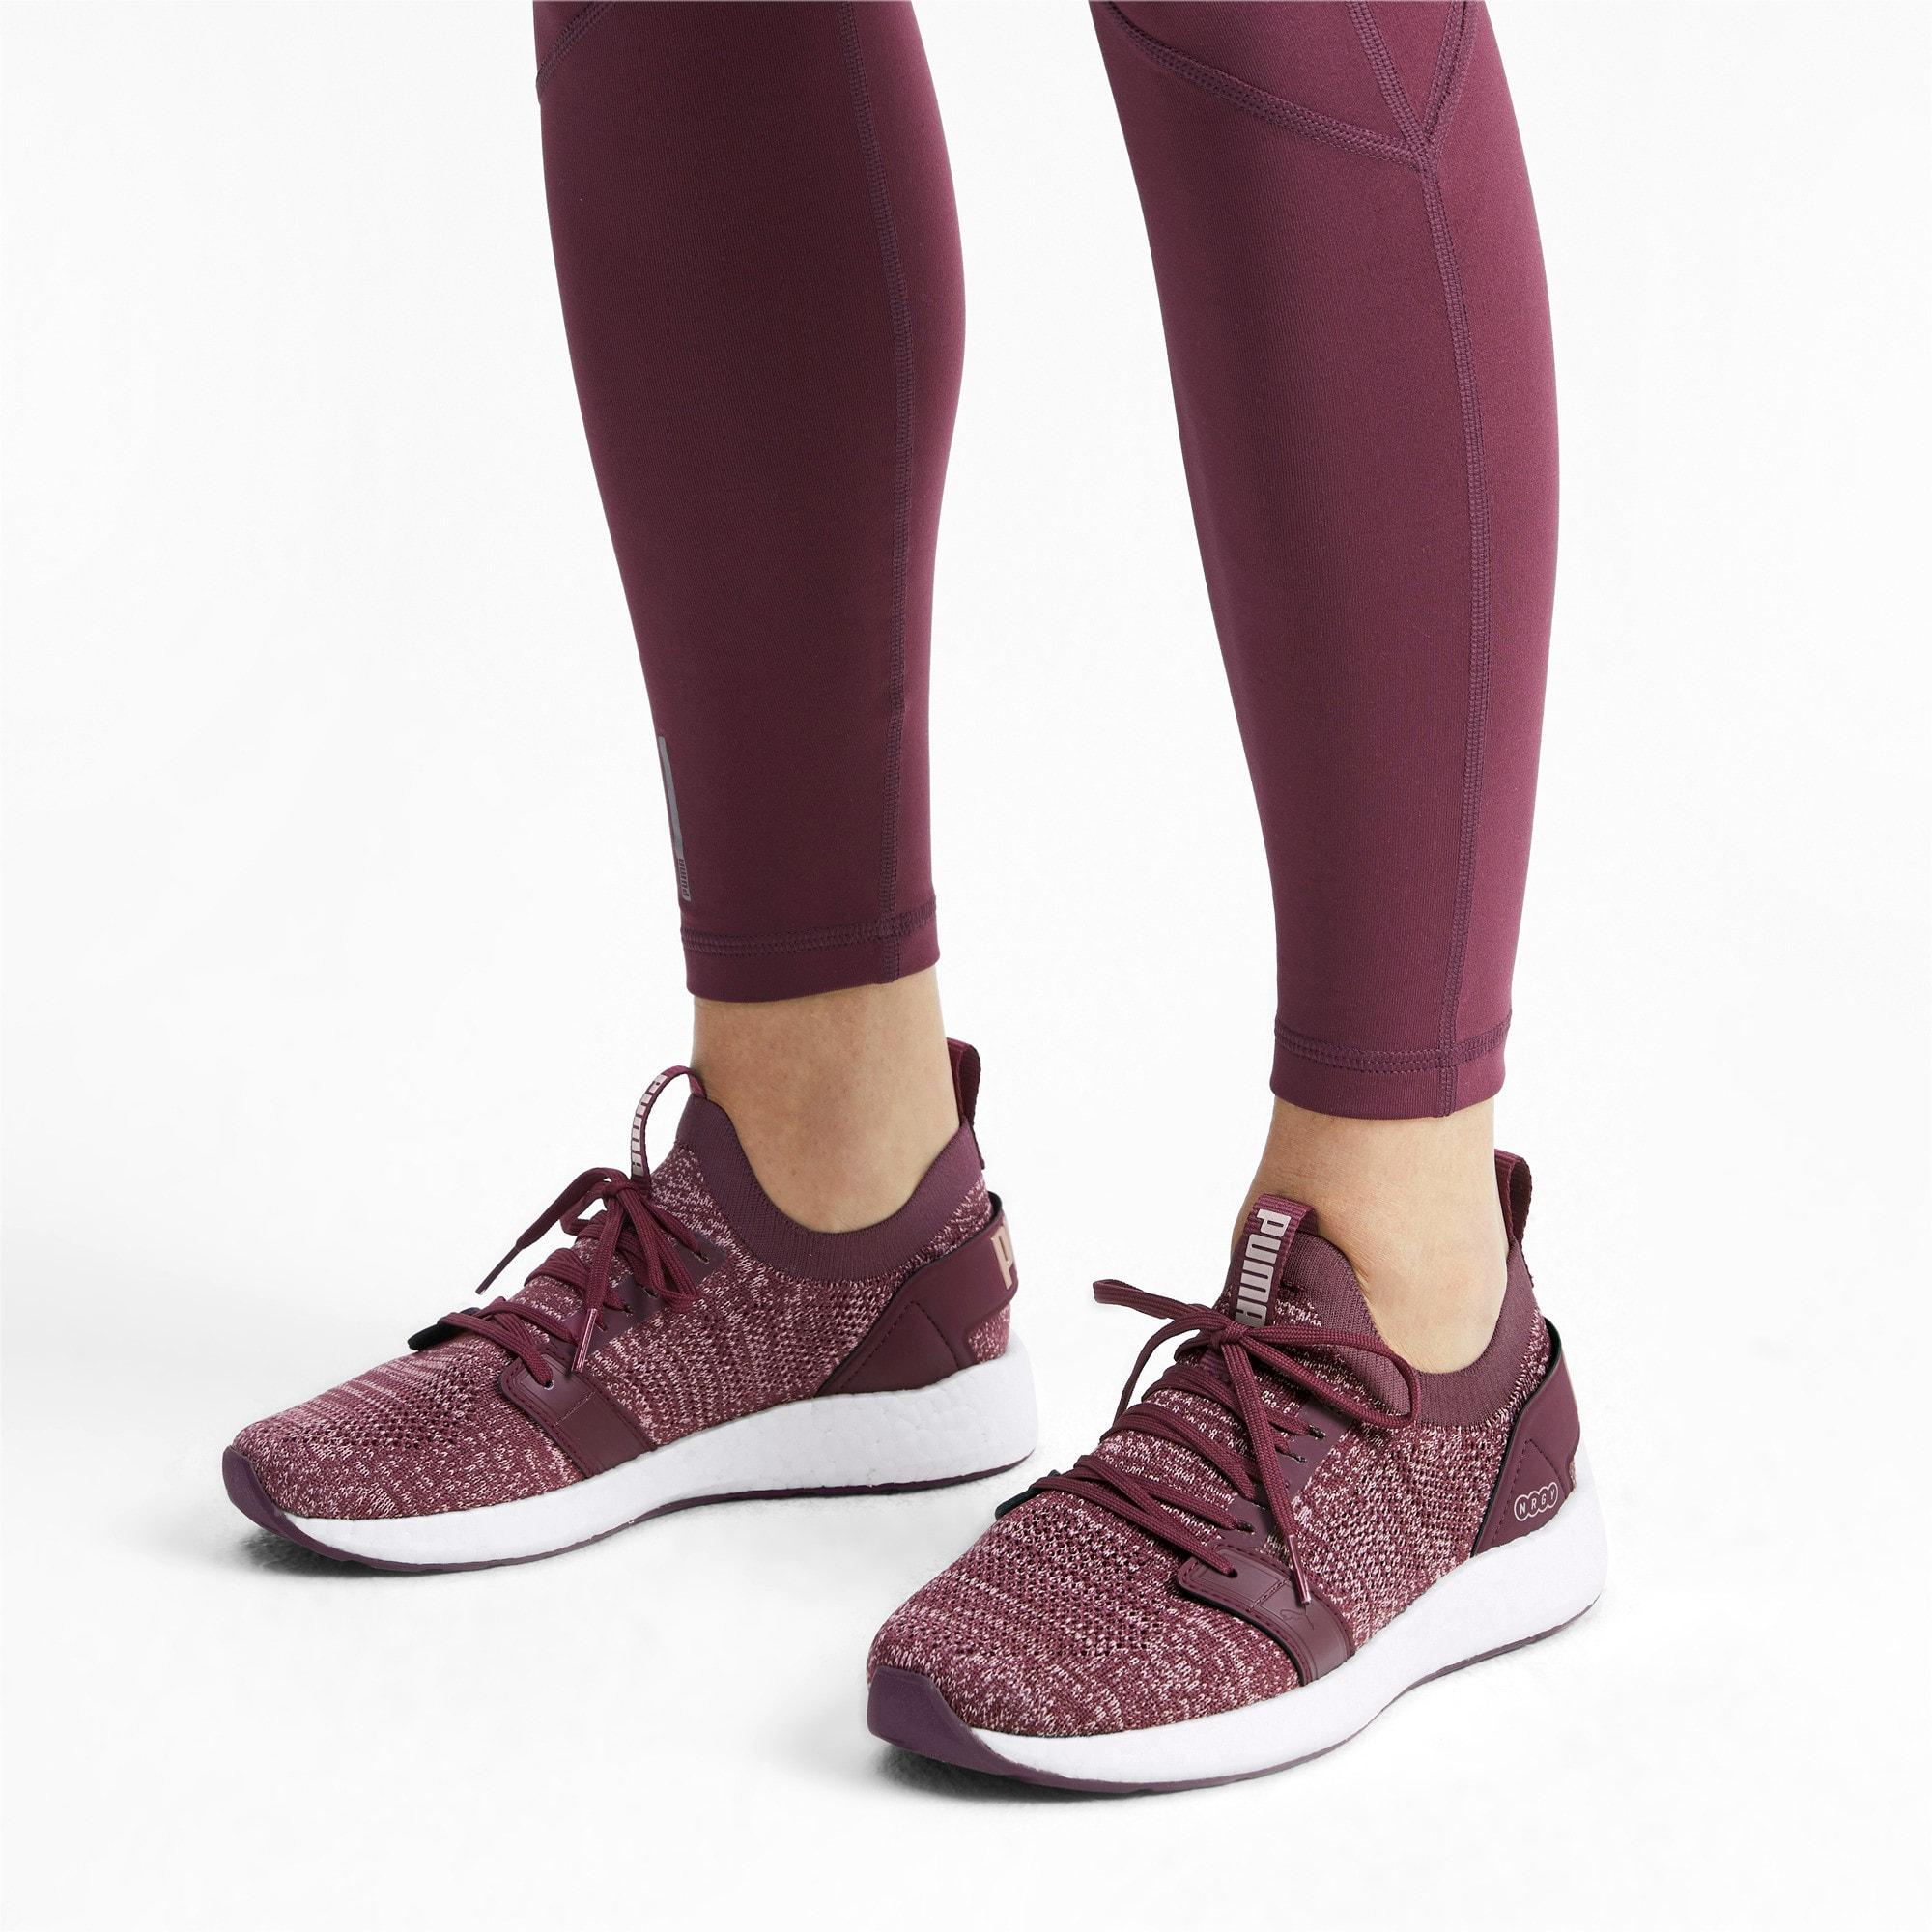 Thumbnail 2 of NRGY Neko Engineer Knit Women's Running Shoes, Vineyard Wine-Rose-White, medium